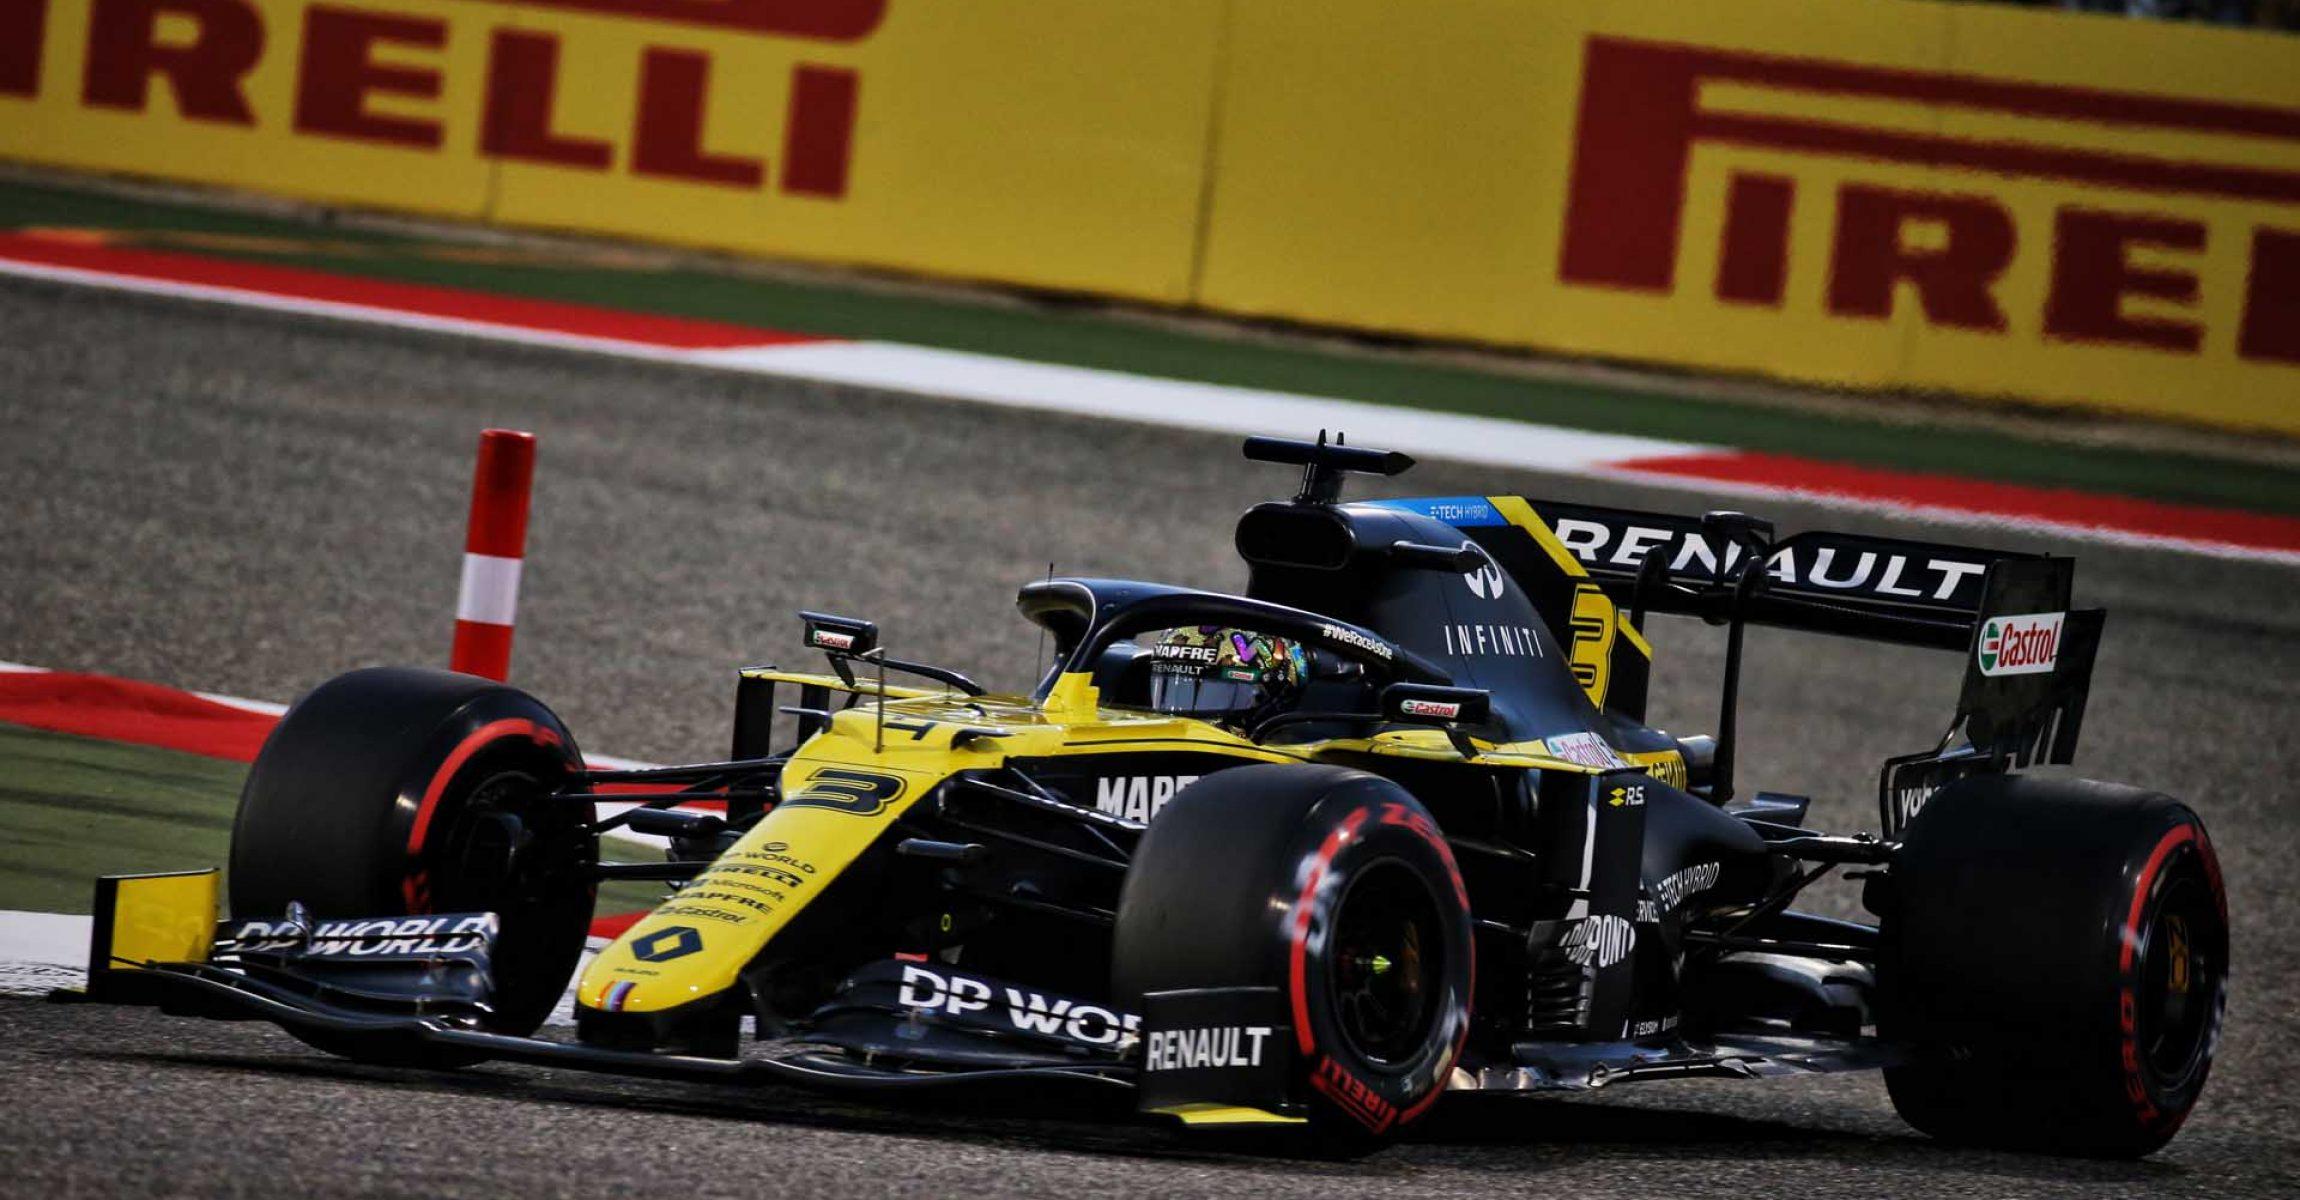 Daniel Ricciardo (AUS) Renault F1 Team RS20. Sakhir Grand Prix, Friday 4th December 2020. Sakhir, Bahrain.